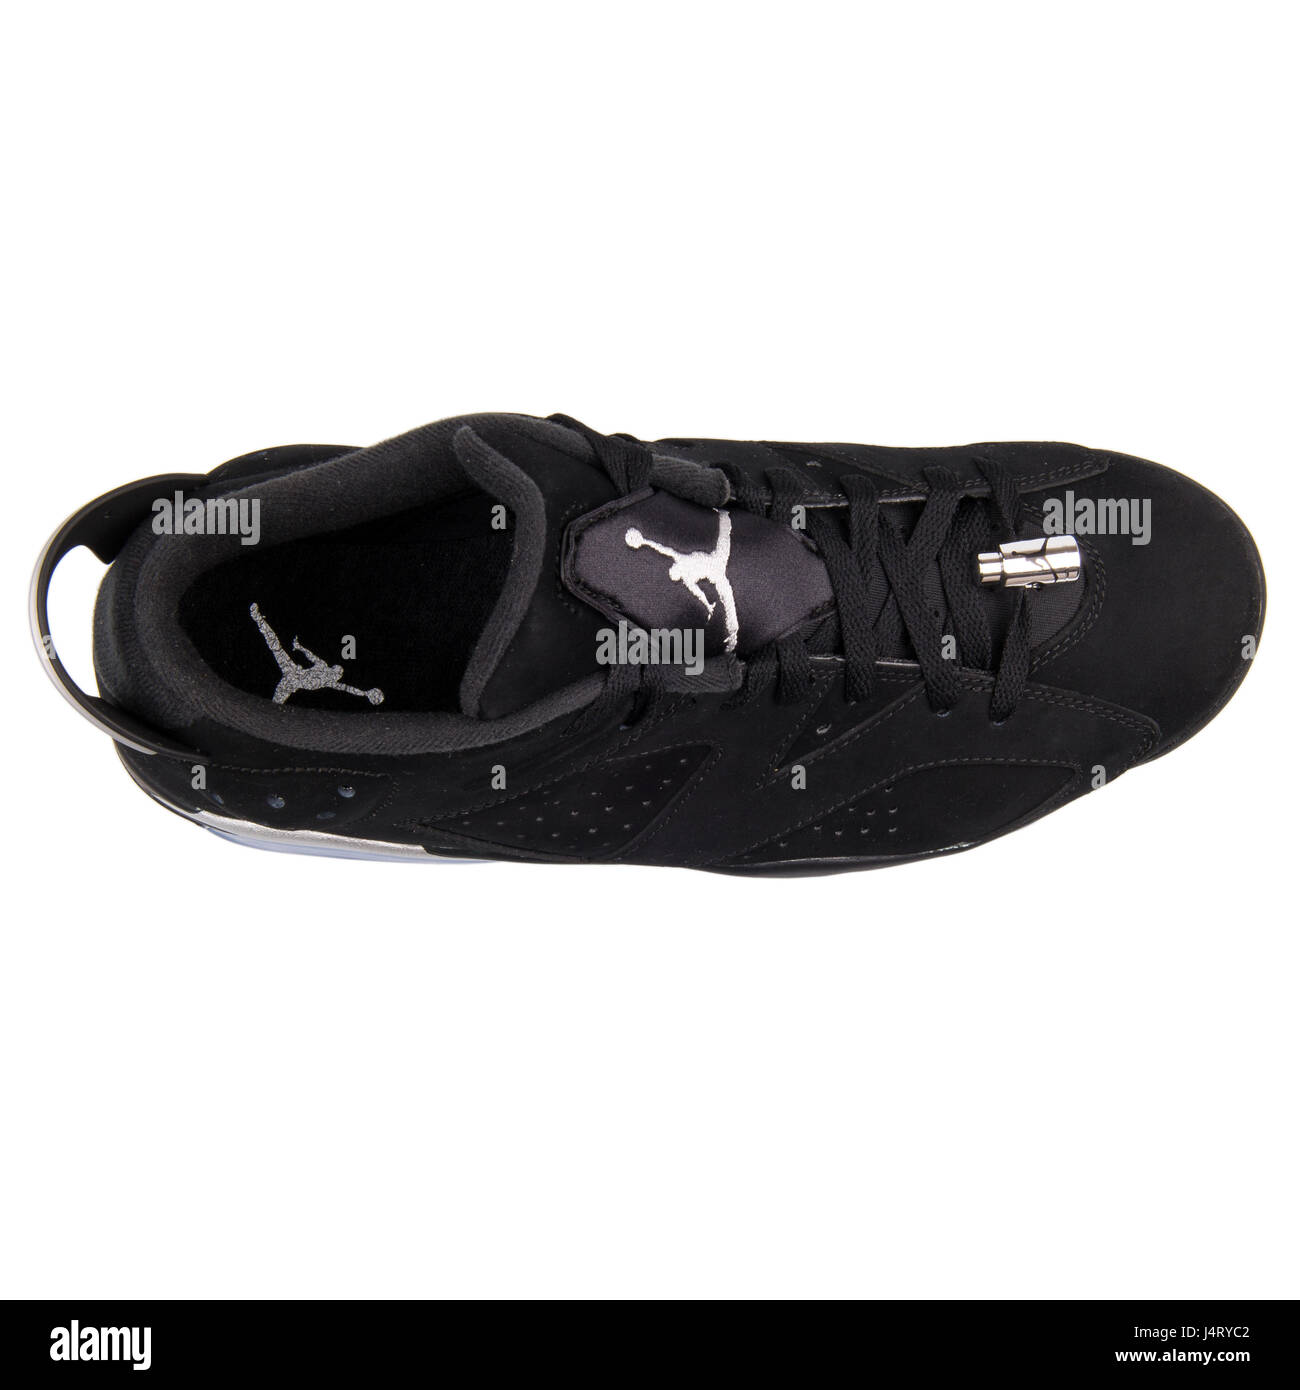 e426c1455de2 Nike Air Jordan VI Retro 6 Low Chrome Black Metallic Silver White Sneakers  - 304401-003